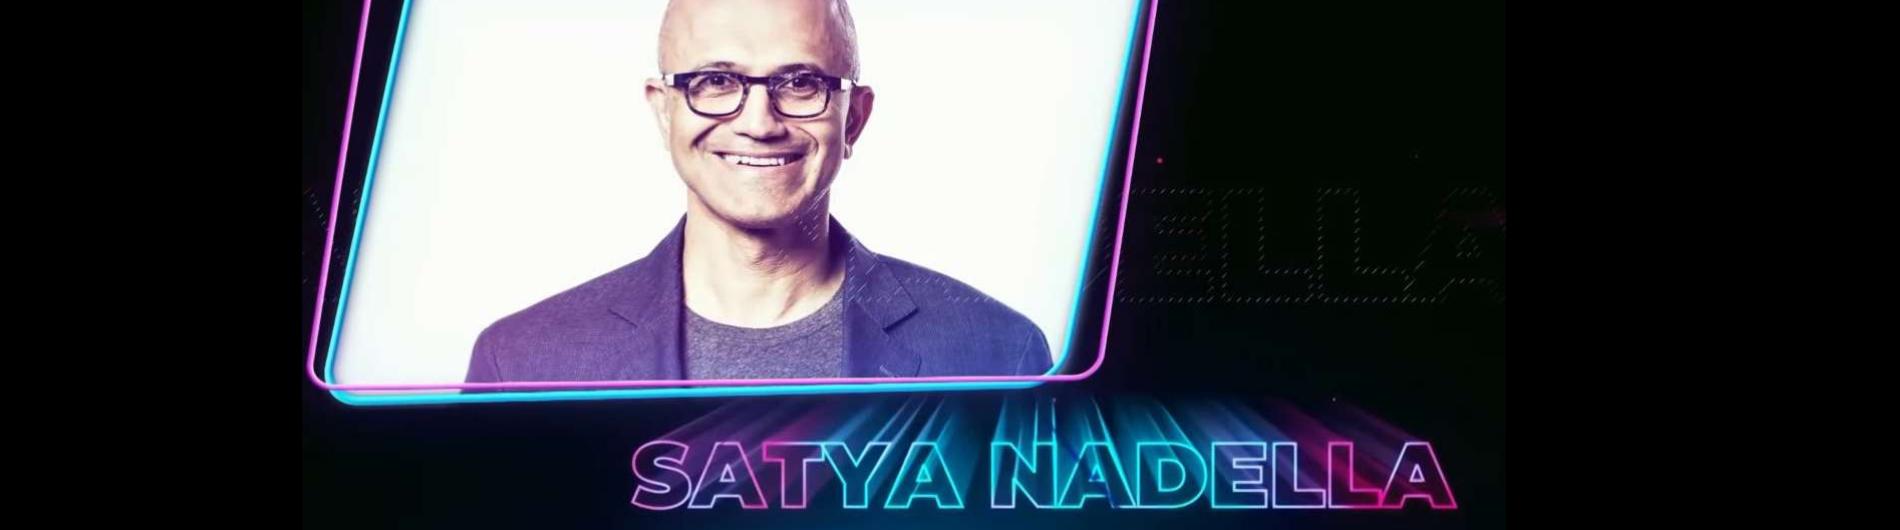 Satya Nadella Telmex